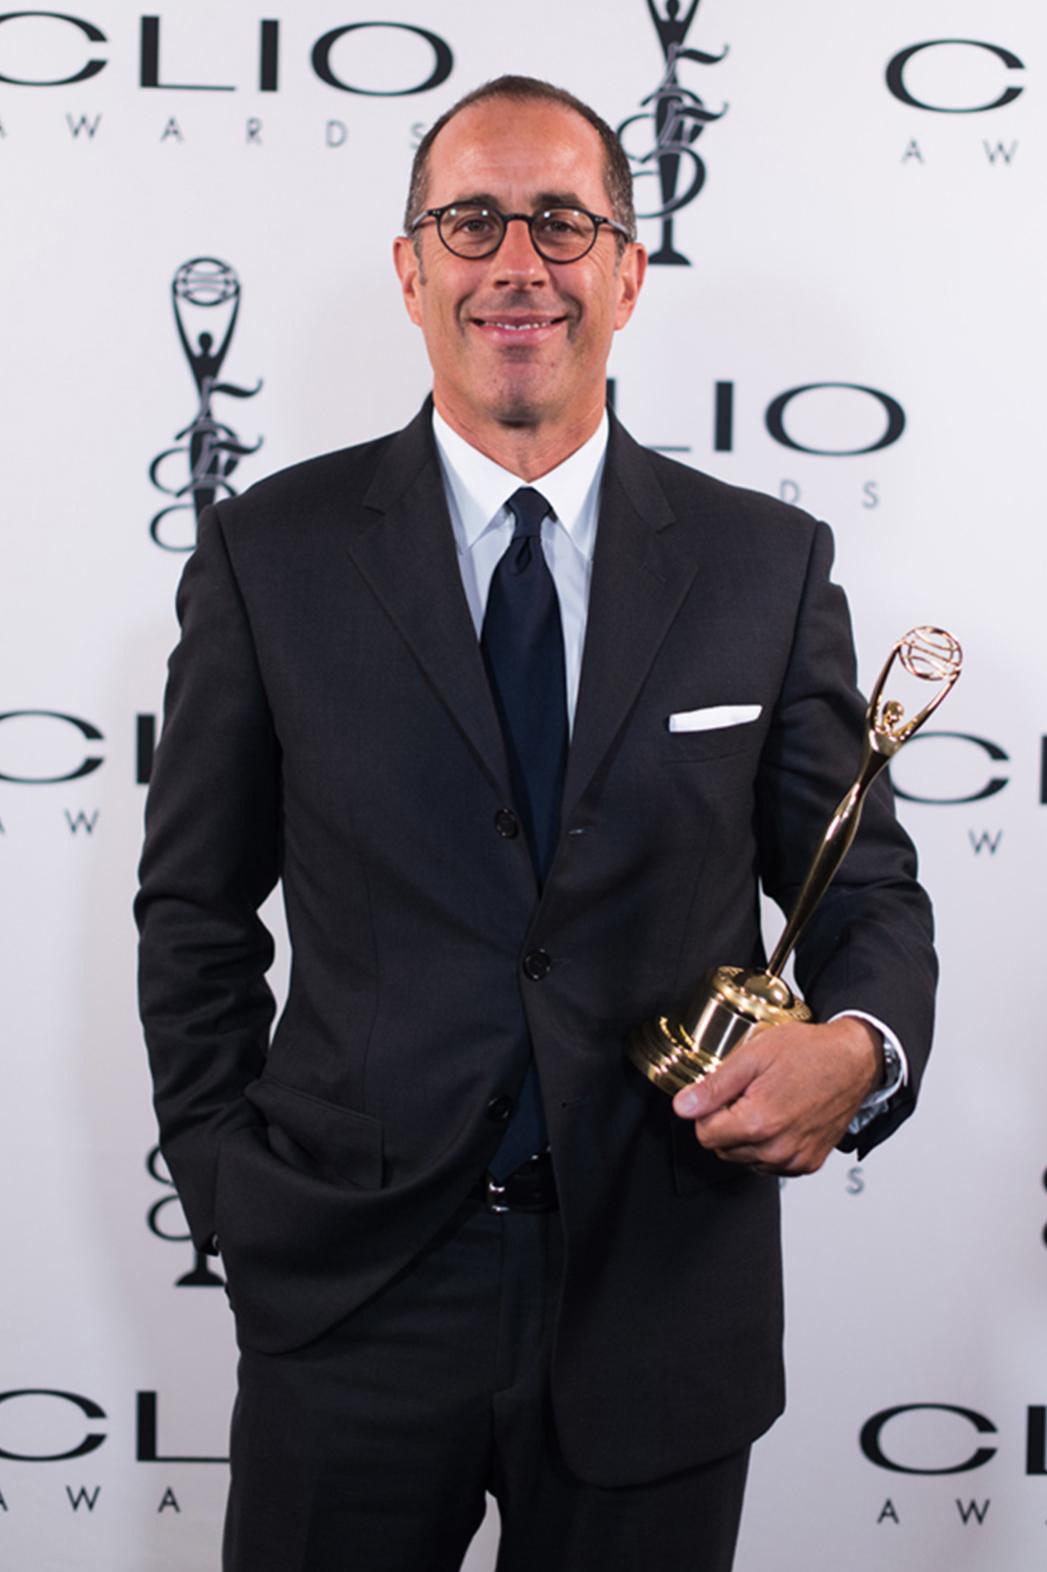 Clio Awards Jerry Seinfeld P 2014